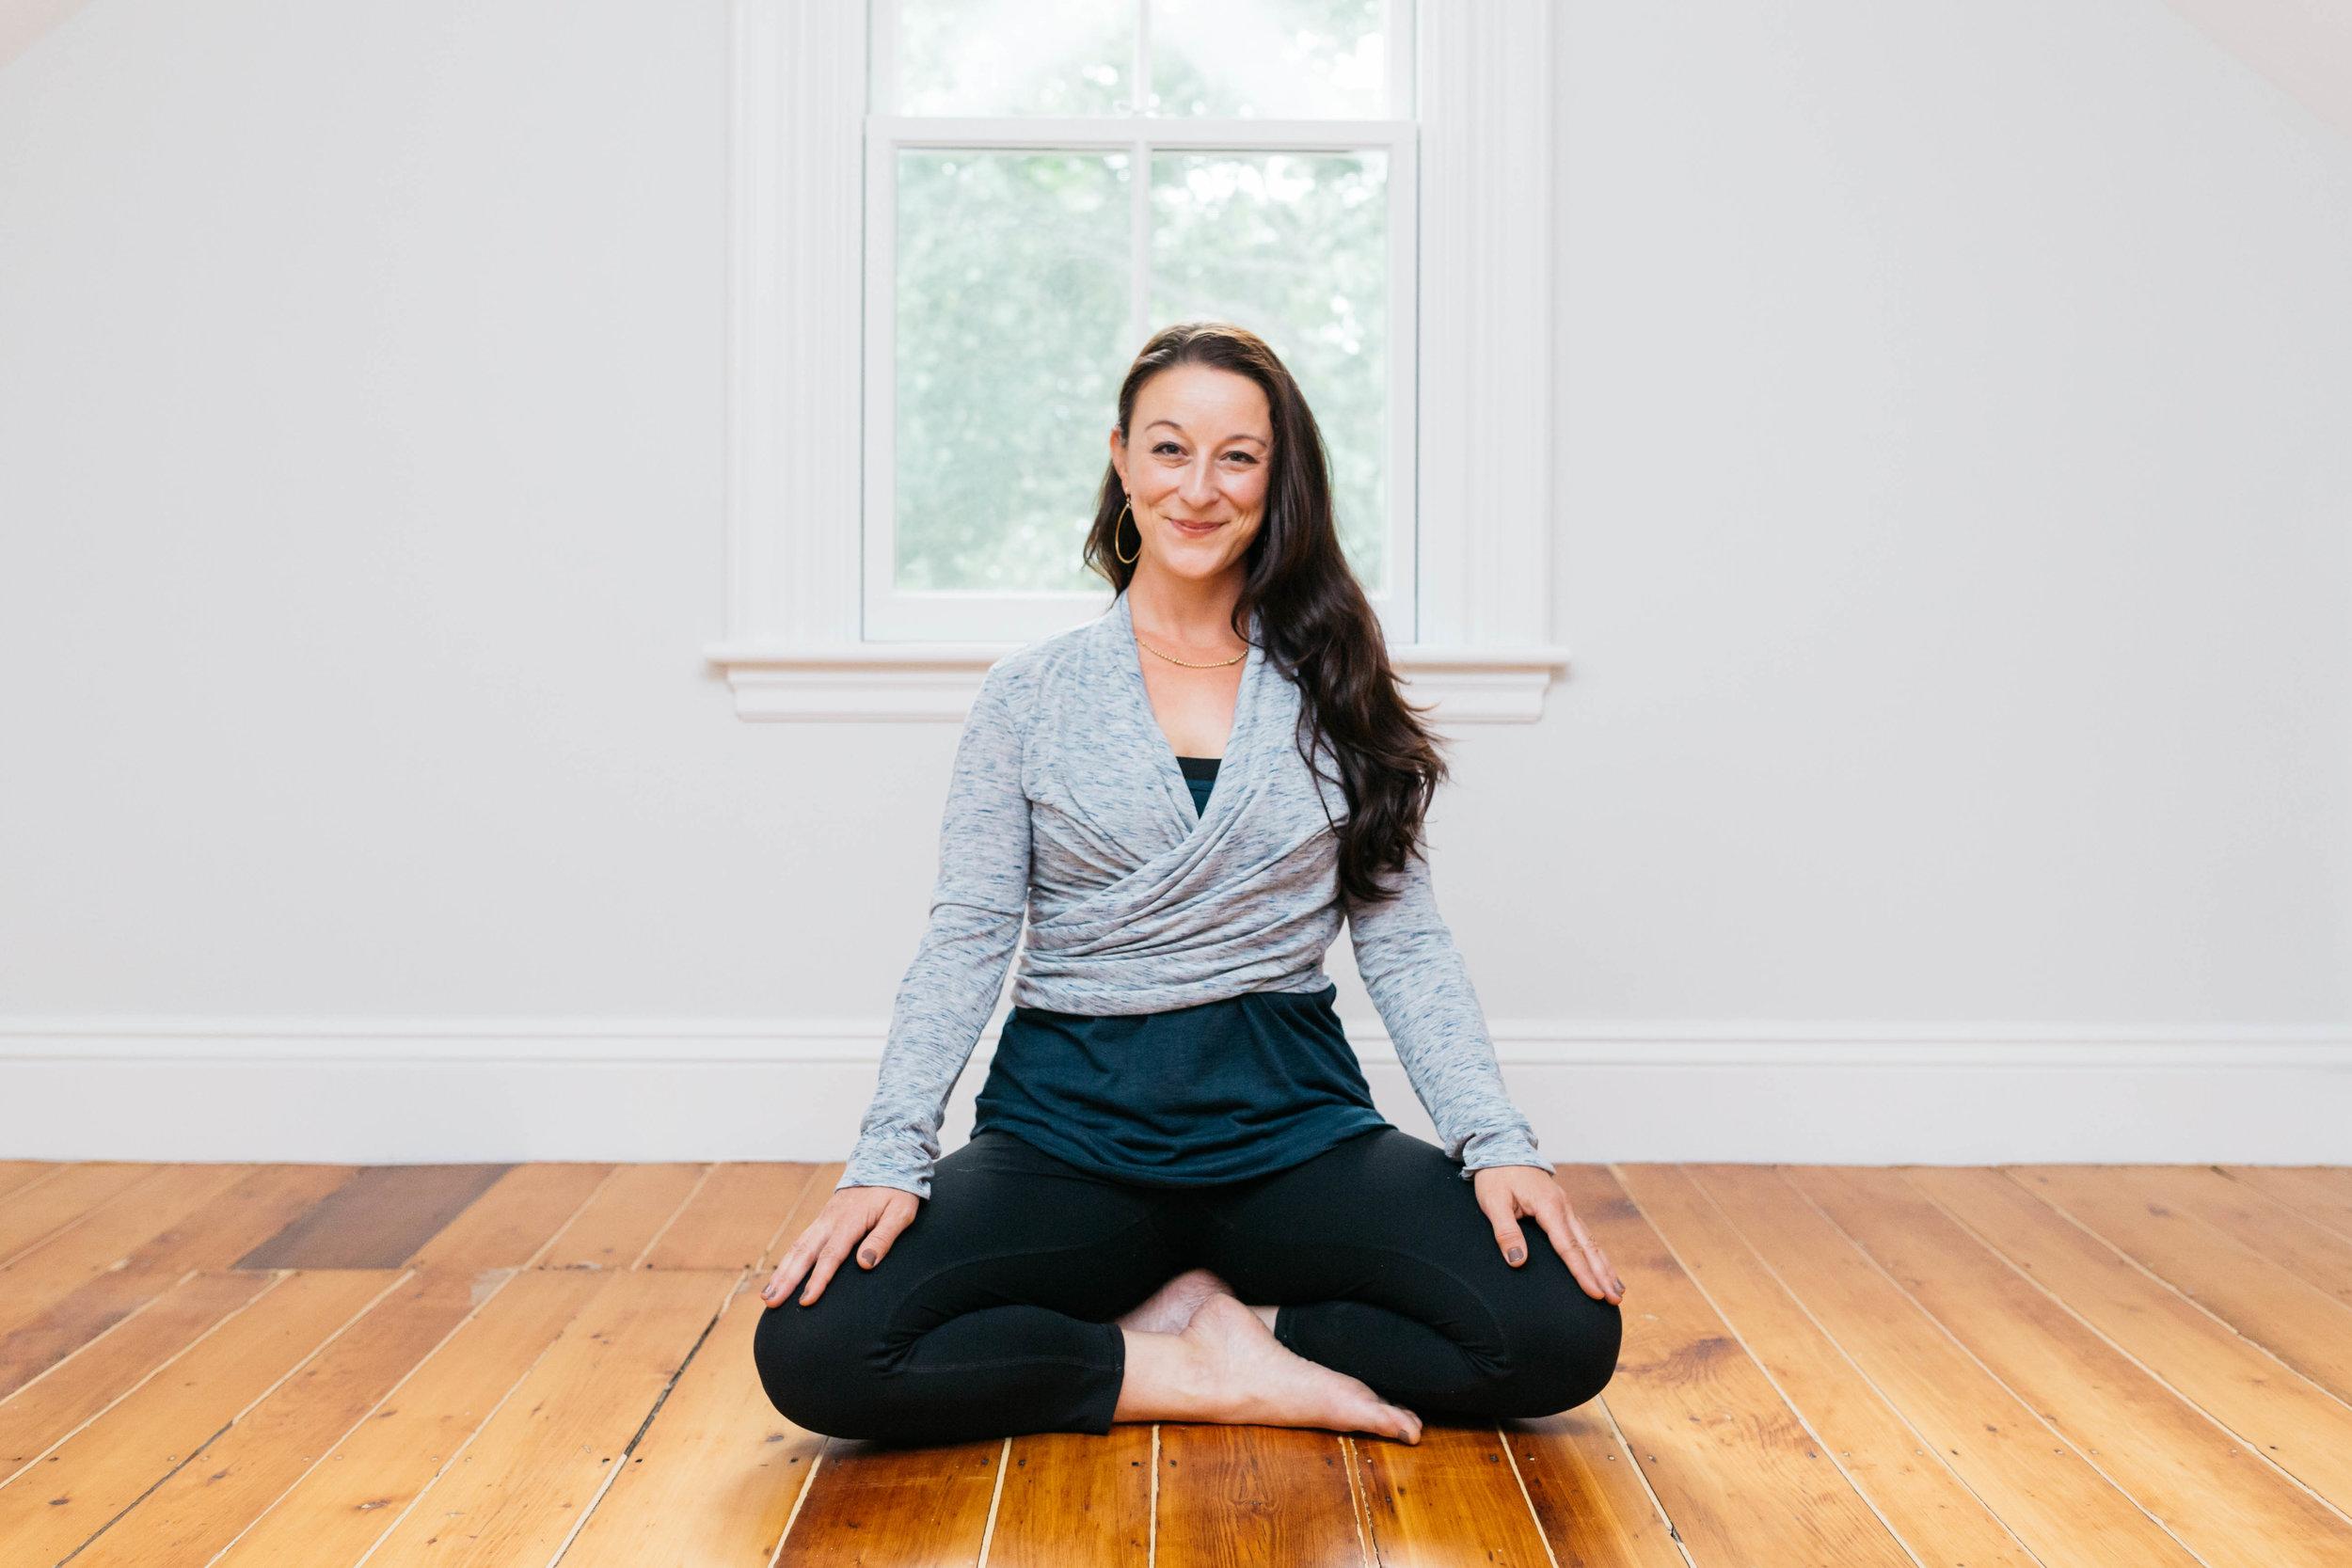 boston-yoga-photographer-christyn-3.jpg